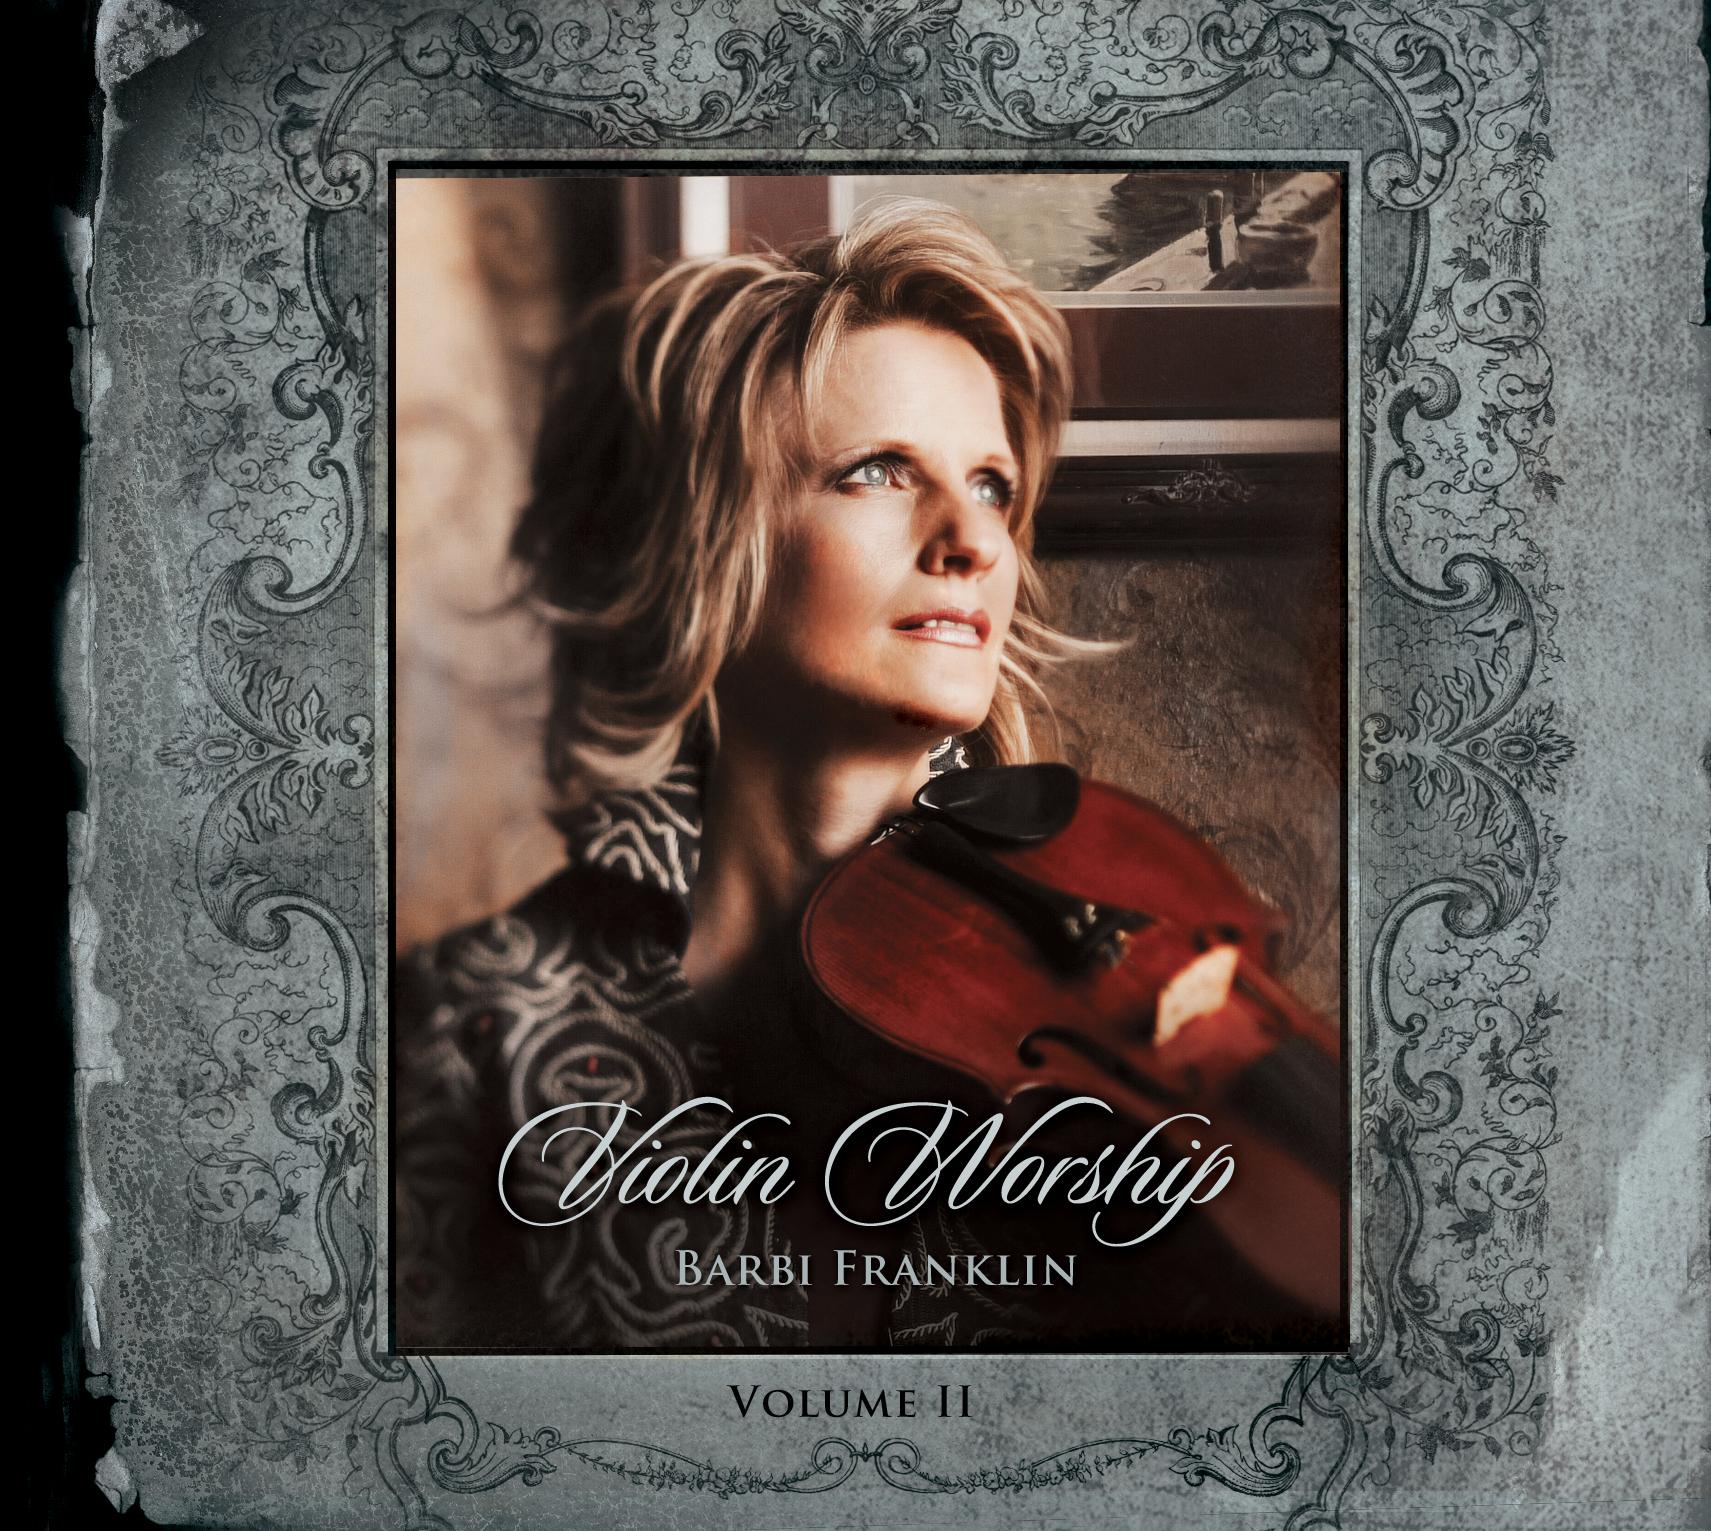 Violin Worship 2